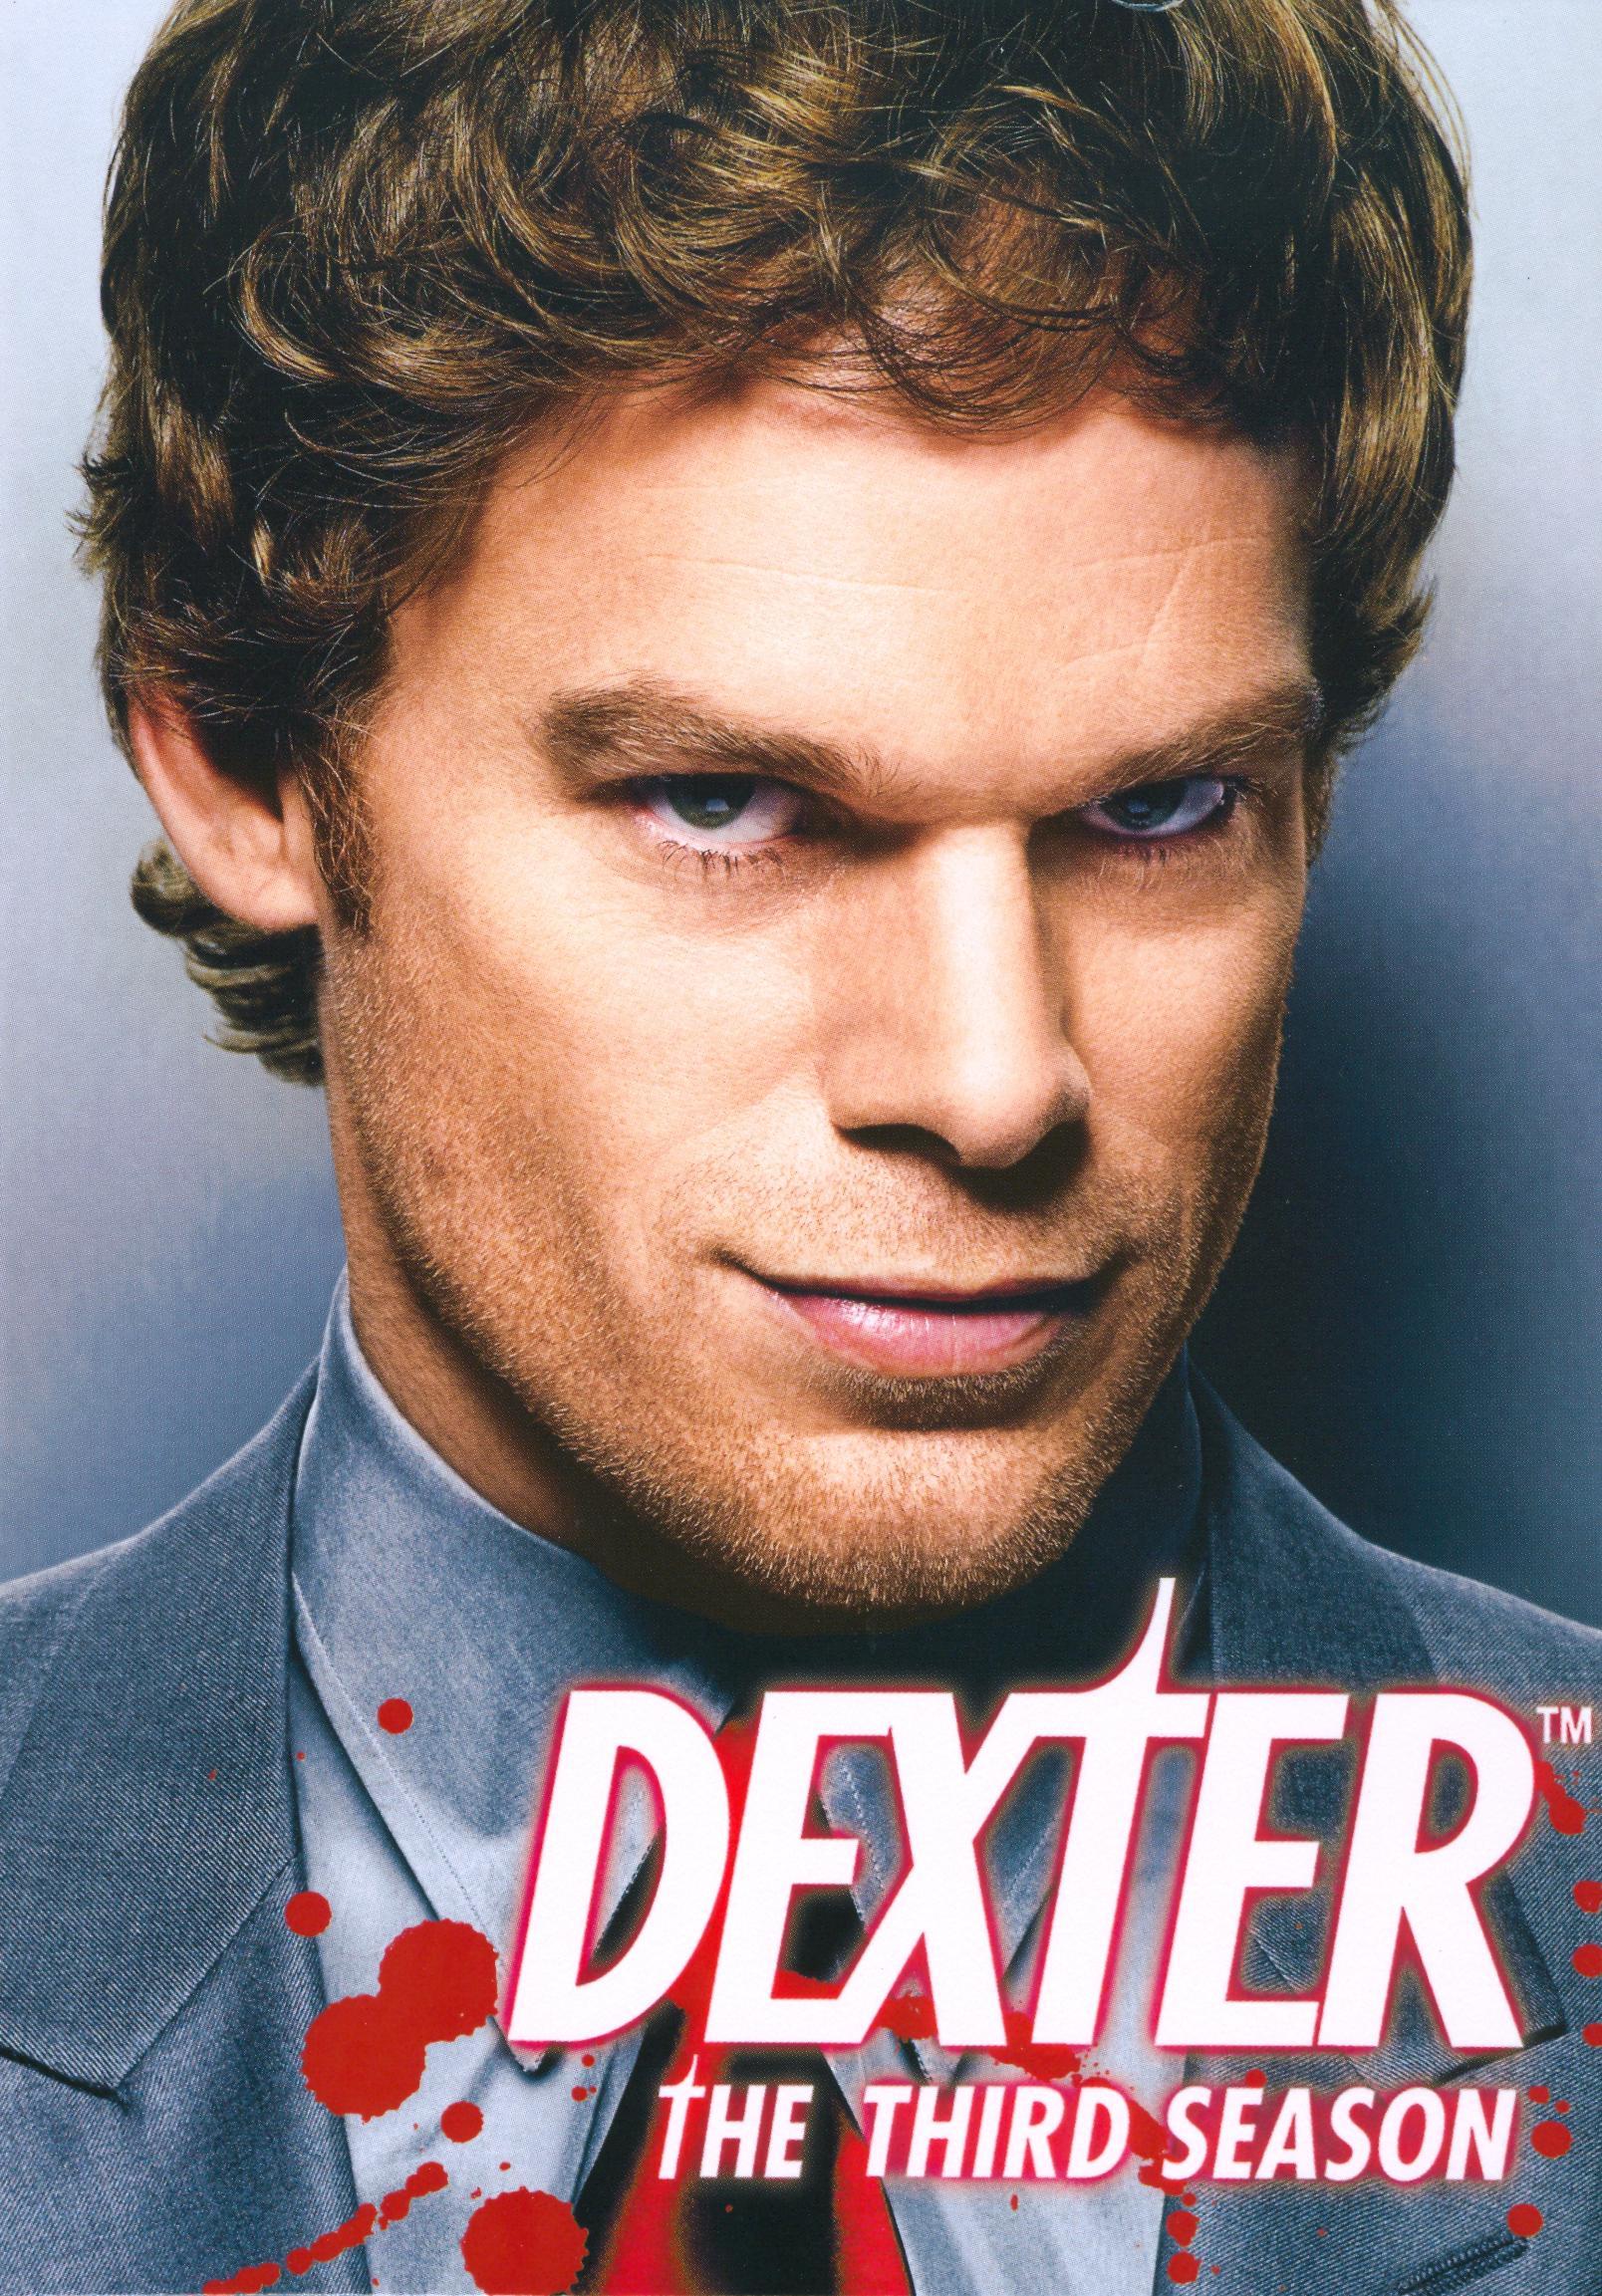 Dexter: The Third Season [4 Discs] (dvd) 9253808